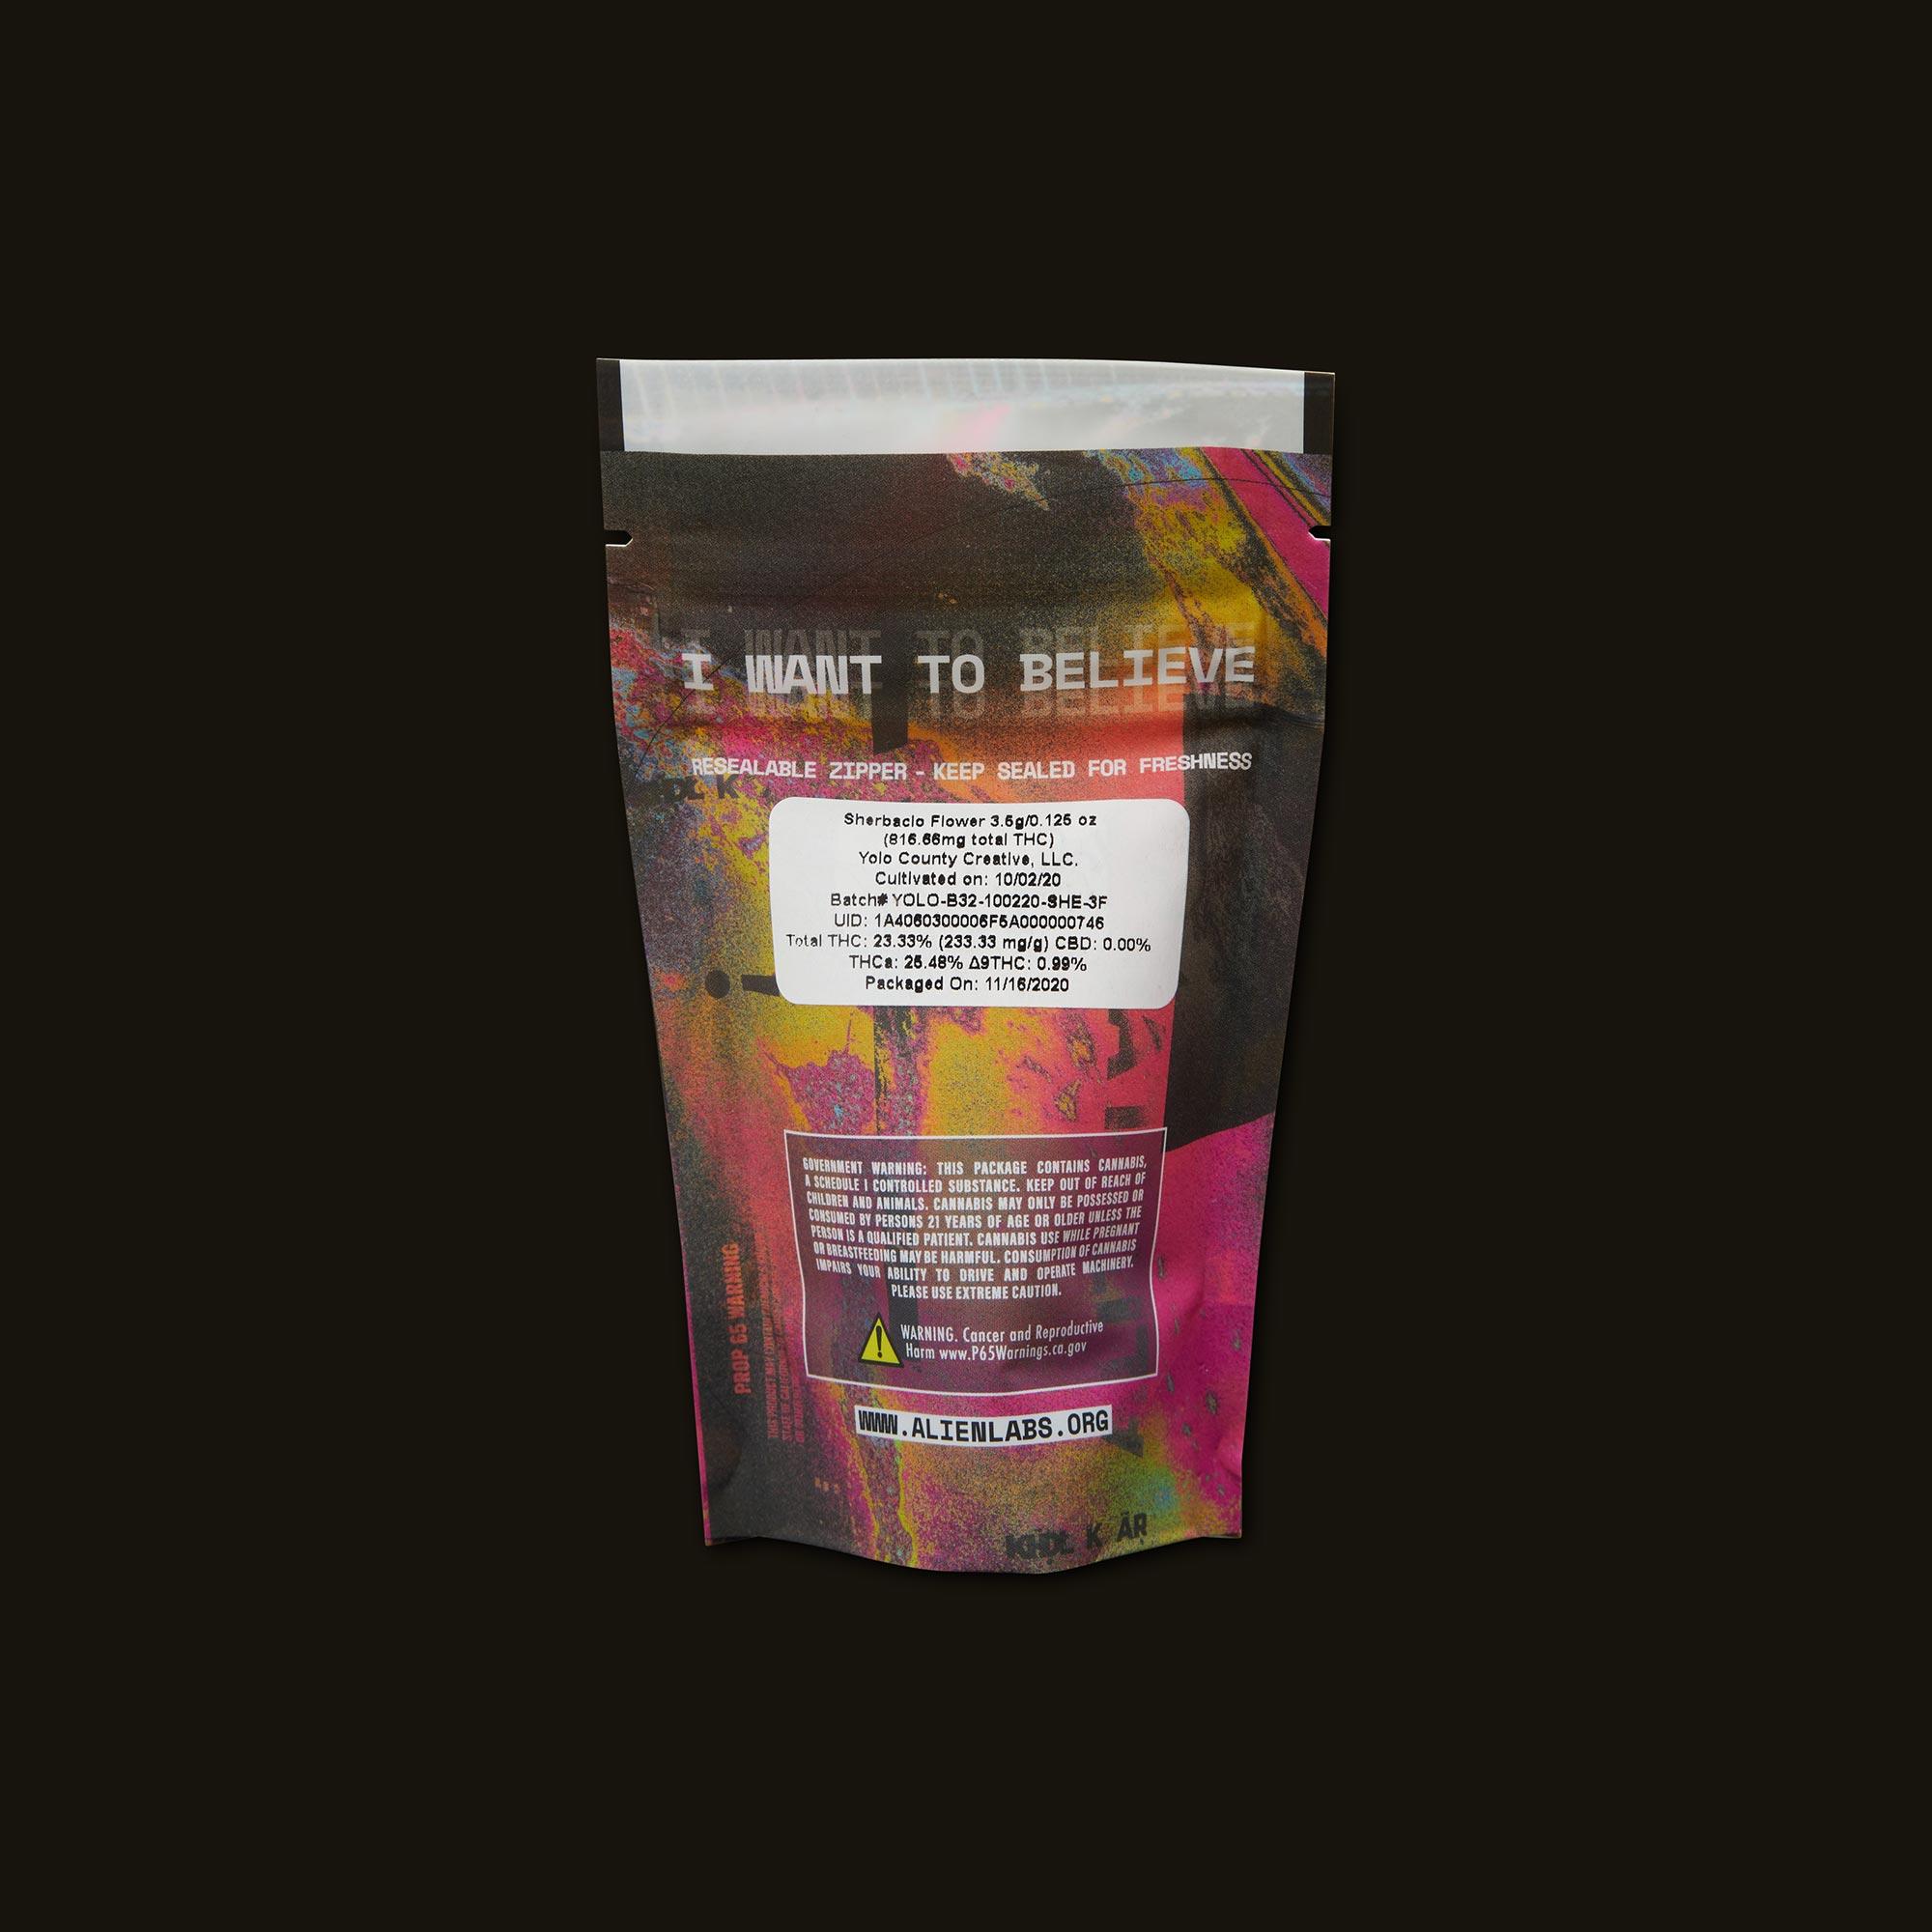 AlienLabs Sungrown Sherbacio Back Packaging